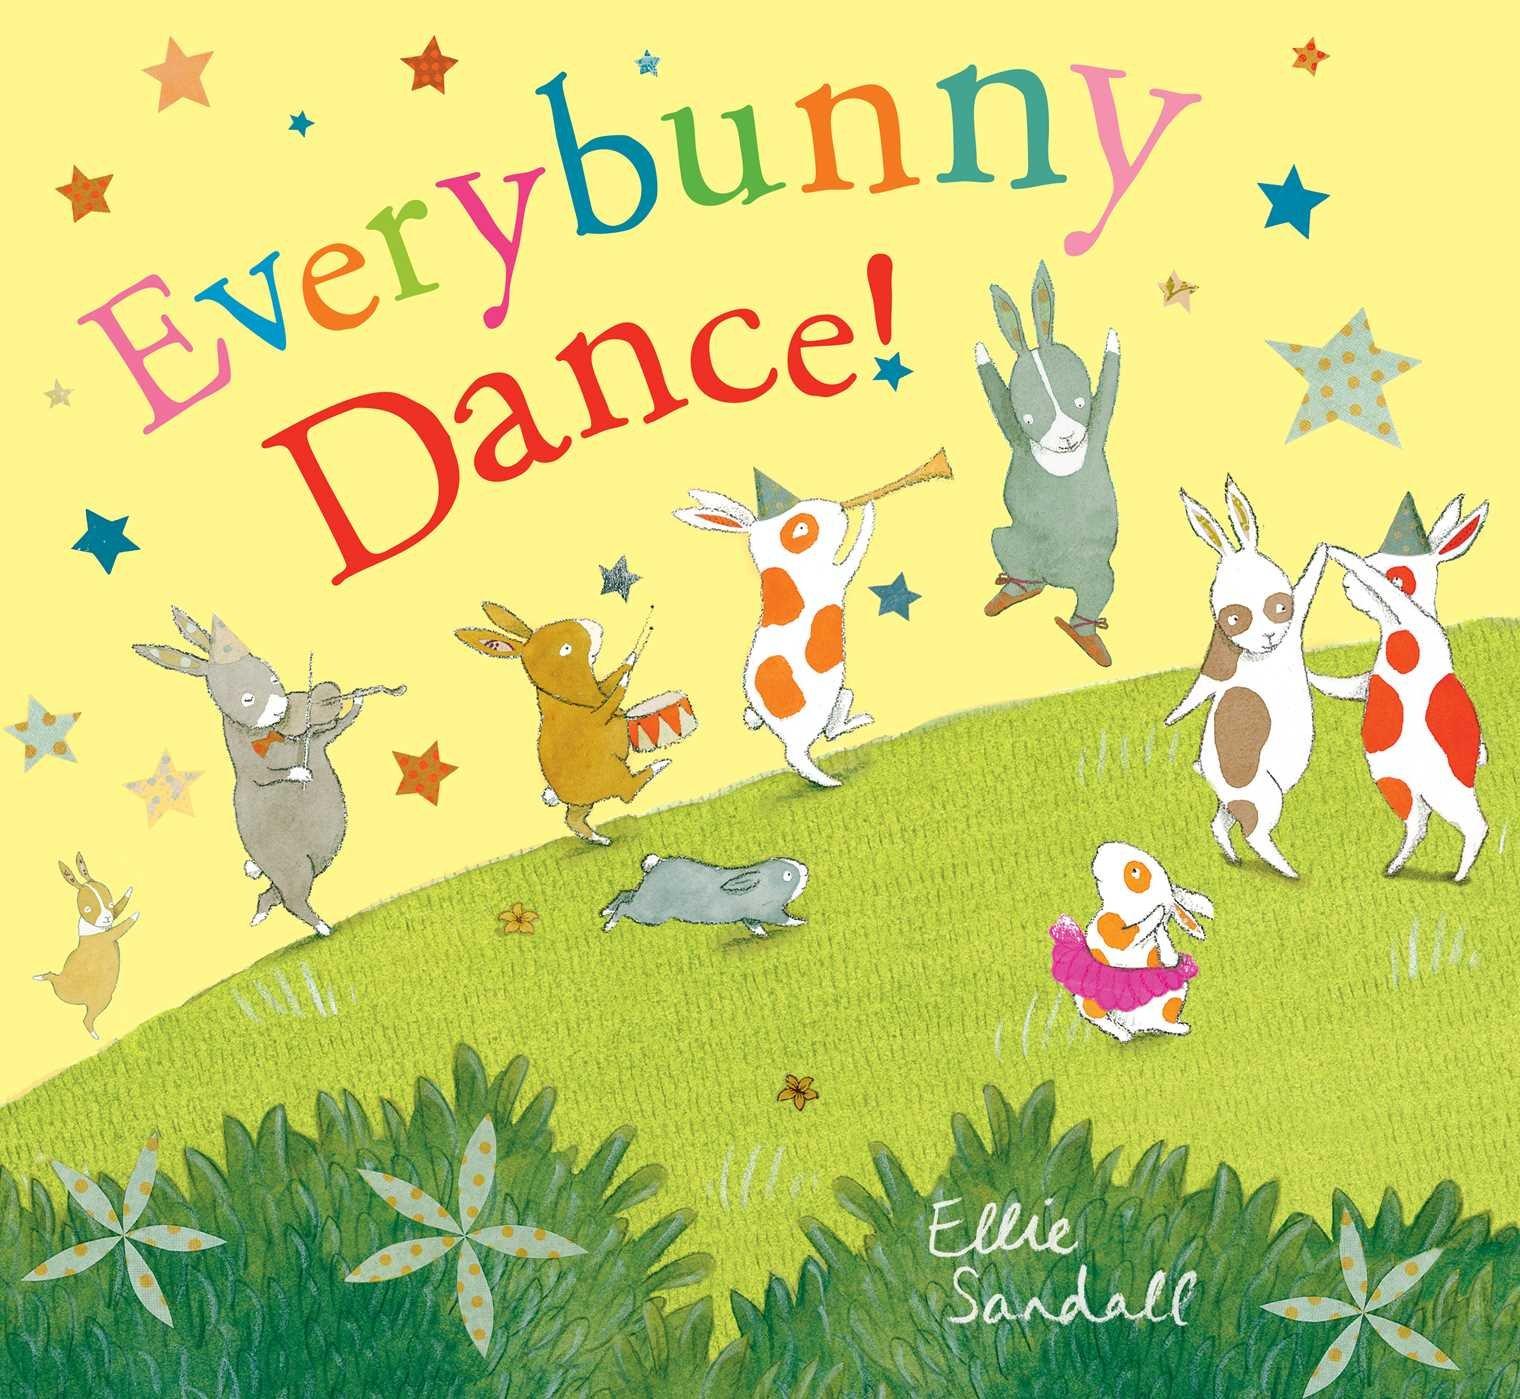 Everybunny Dance! por Ellie Sandall